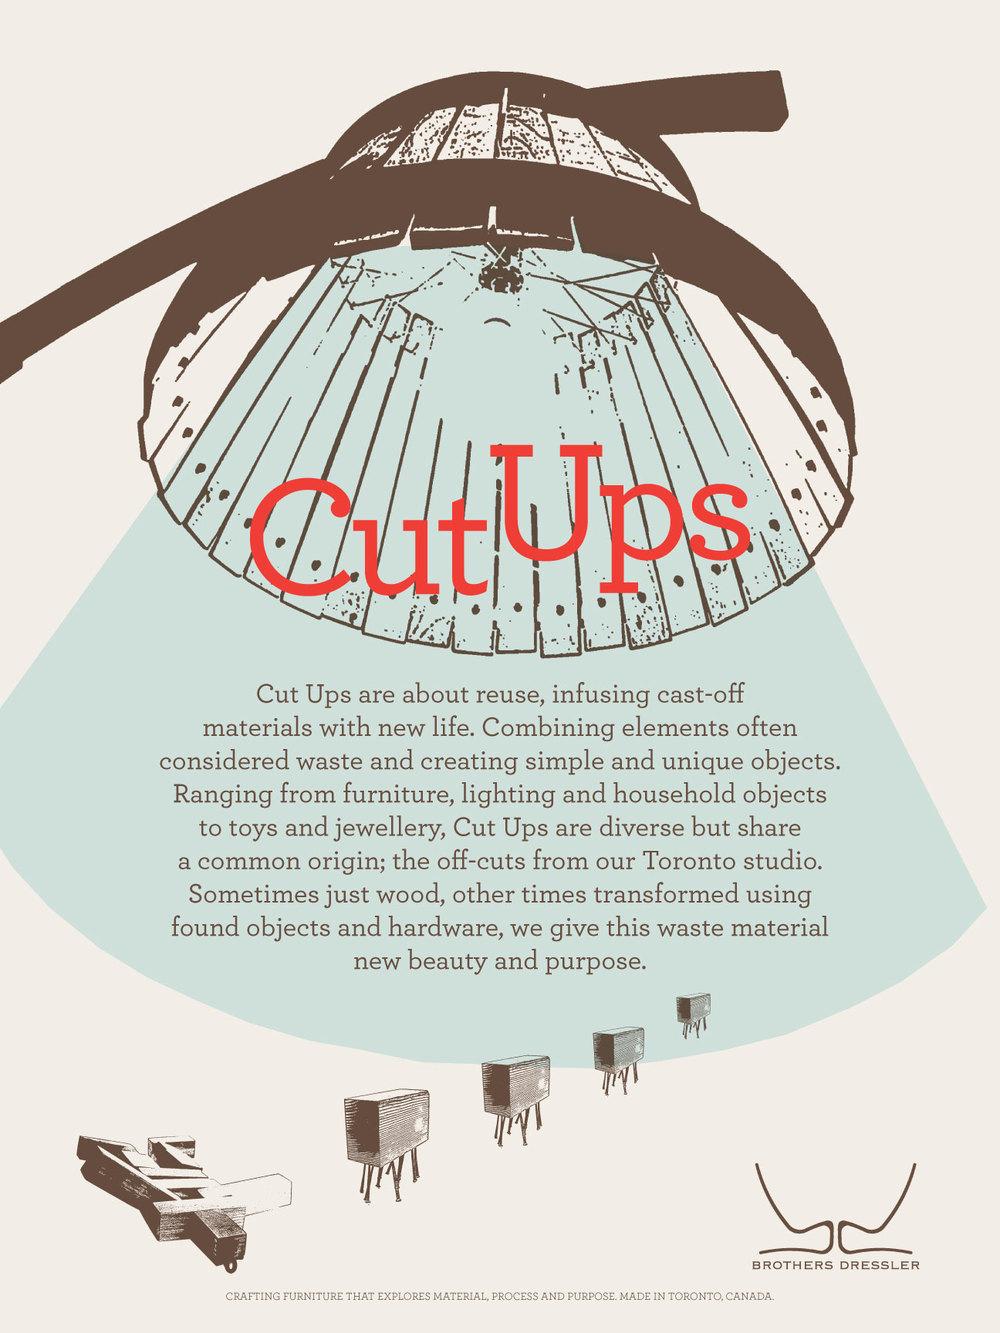 CutUps_poster1b.jpg